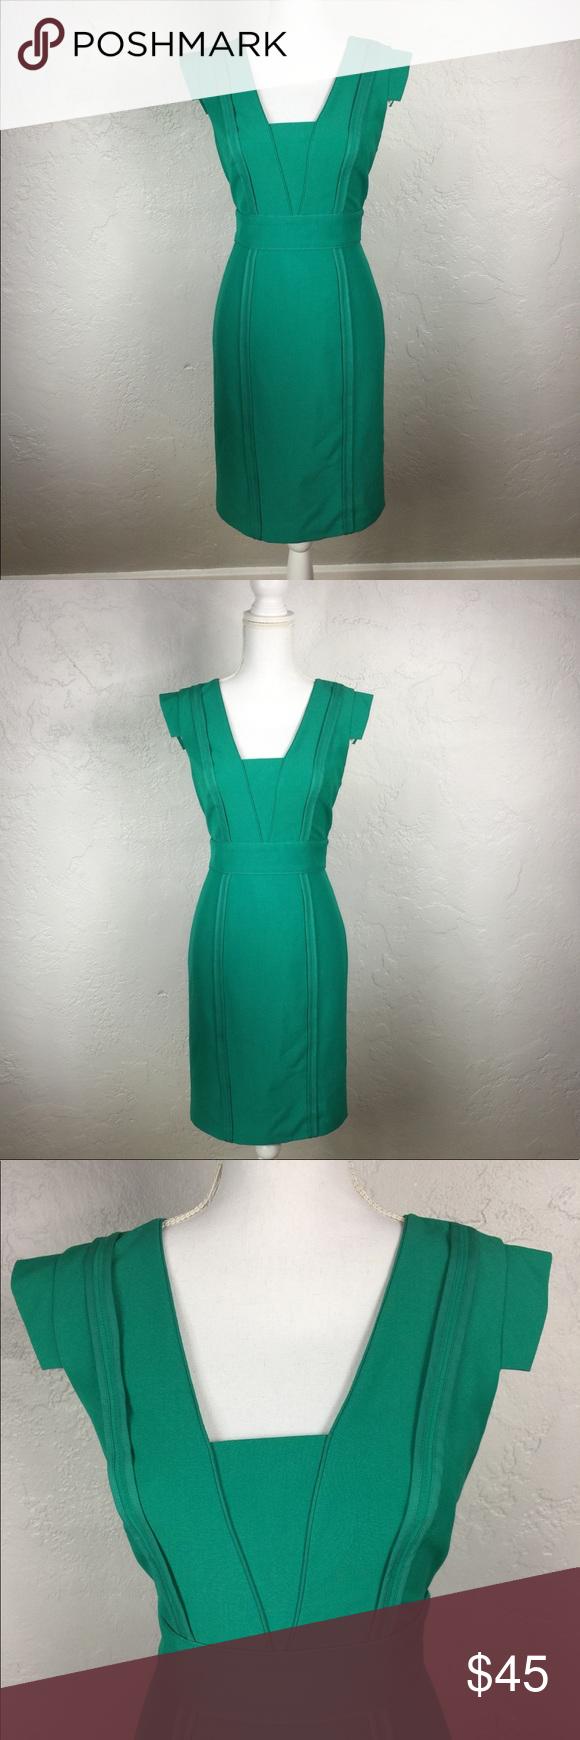 Nwt Vince Camuto Viridian Green Sheath Dress Sheath Dress Vince Camuto Dresses [ 1740 x 580 Pixel ]